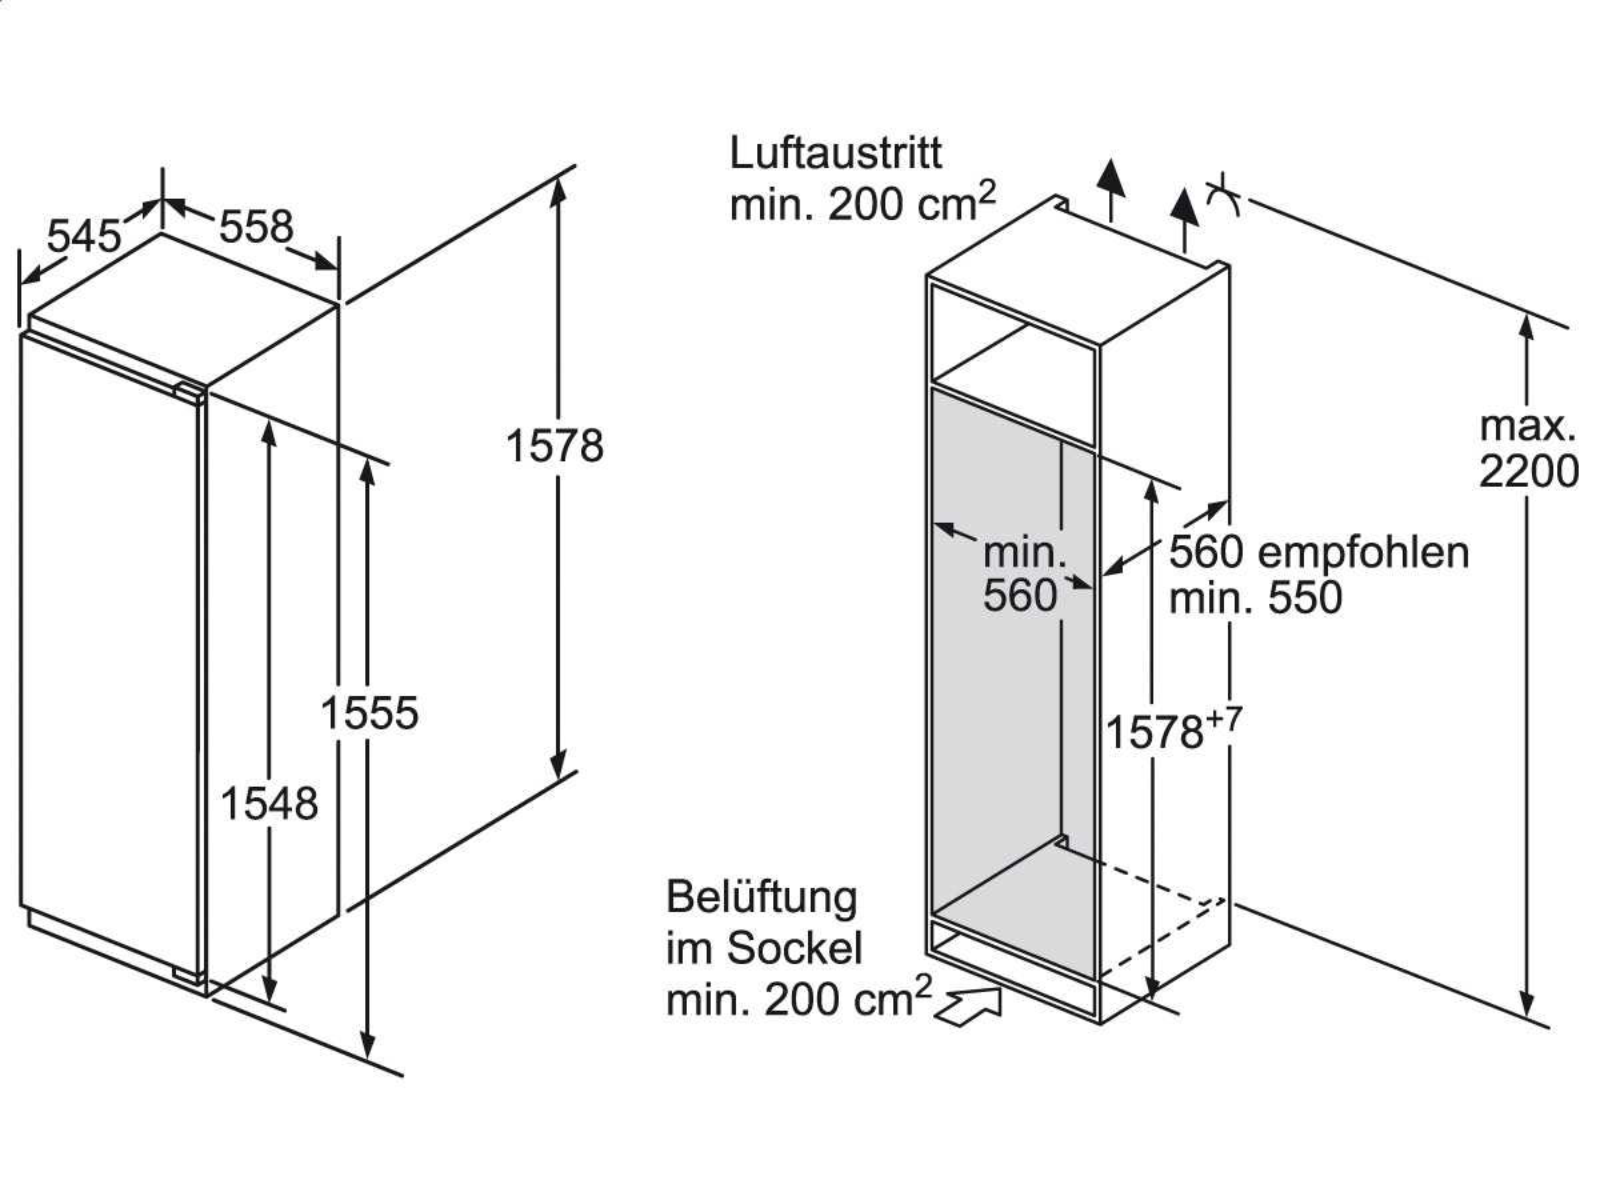 siemens ki72lad30 einbauk hlschrank 4242003621950 ebay. Black Bedroom Furniture Sets. Home Design Ideas